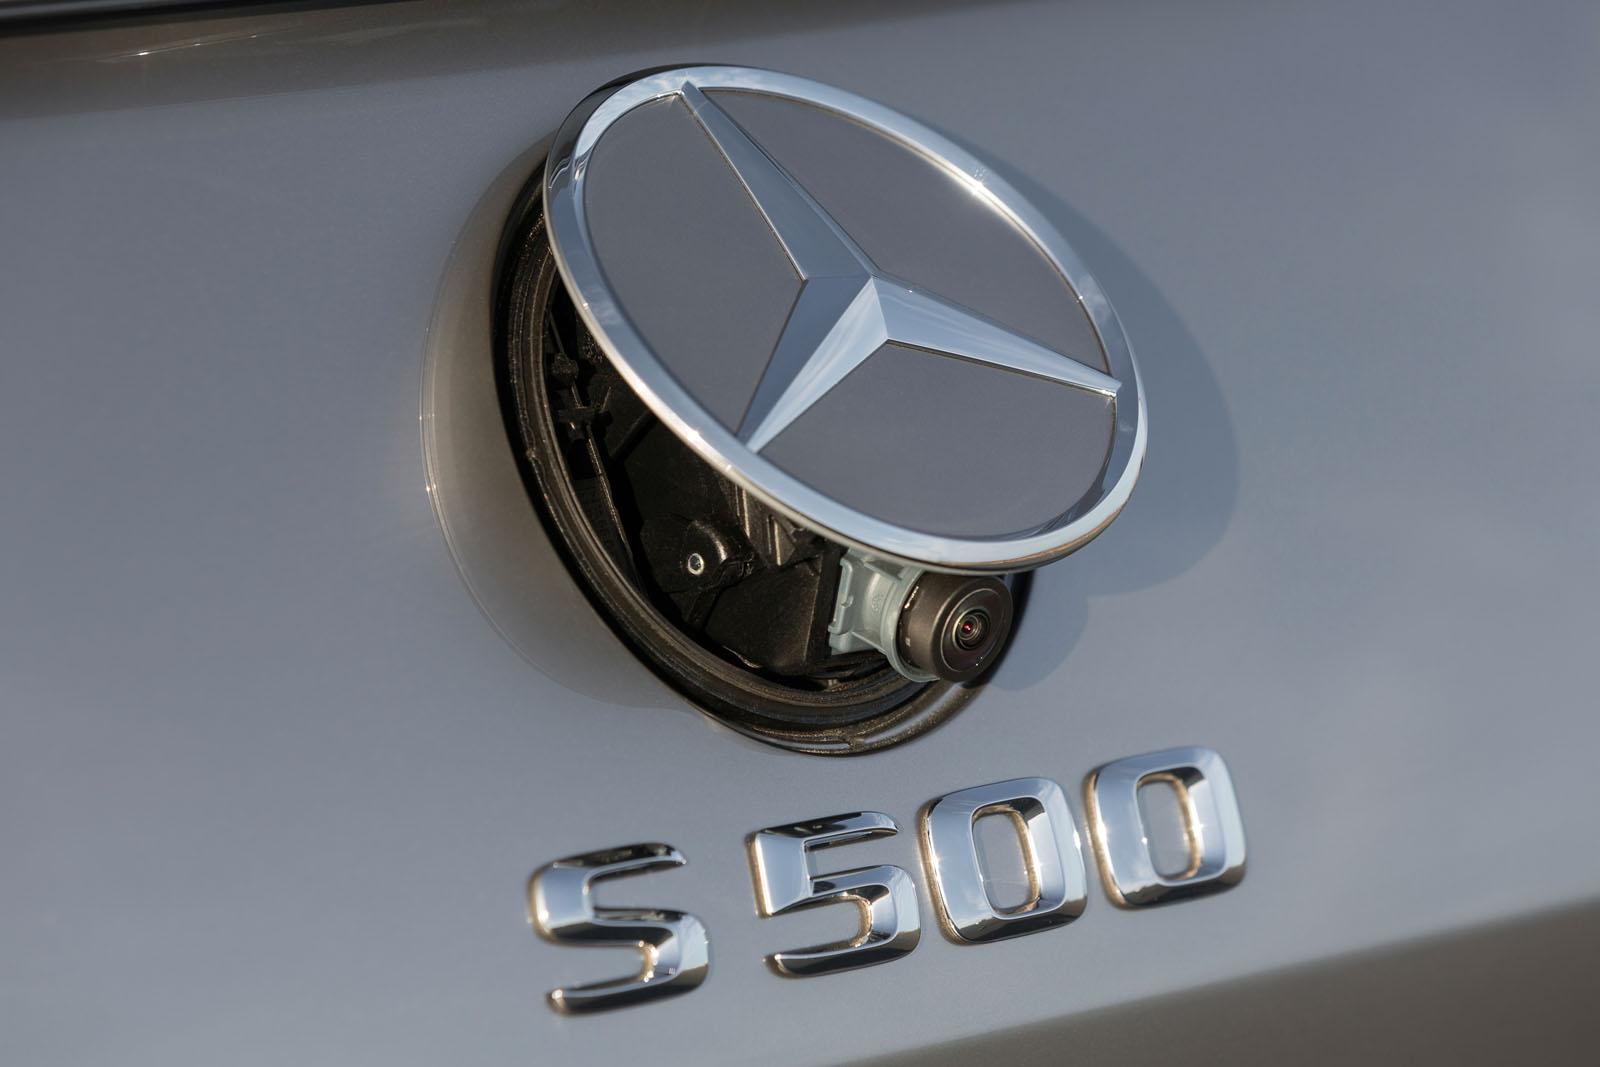 mercedes classe s 500 coup intemporelle french driver. Black Bedroom Furniture Sets. Home Design Ideas